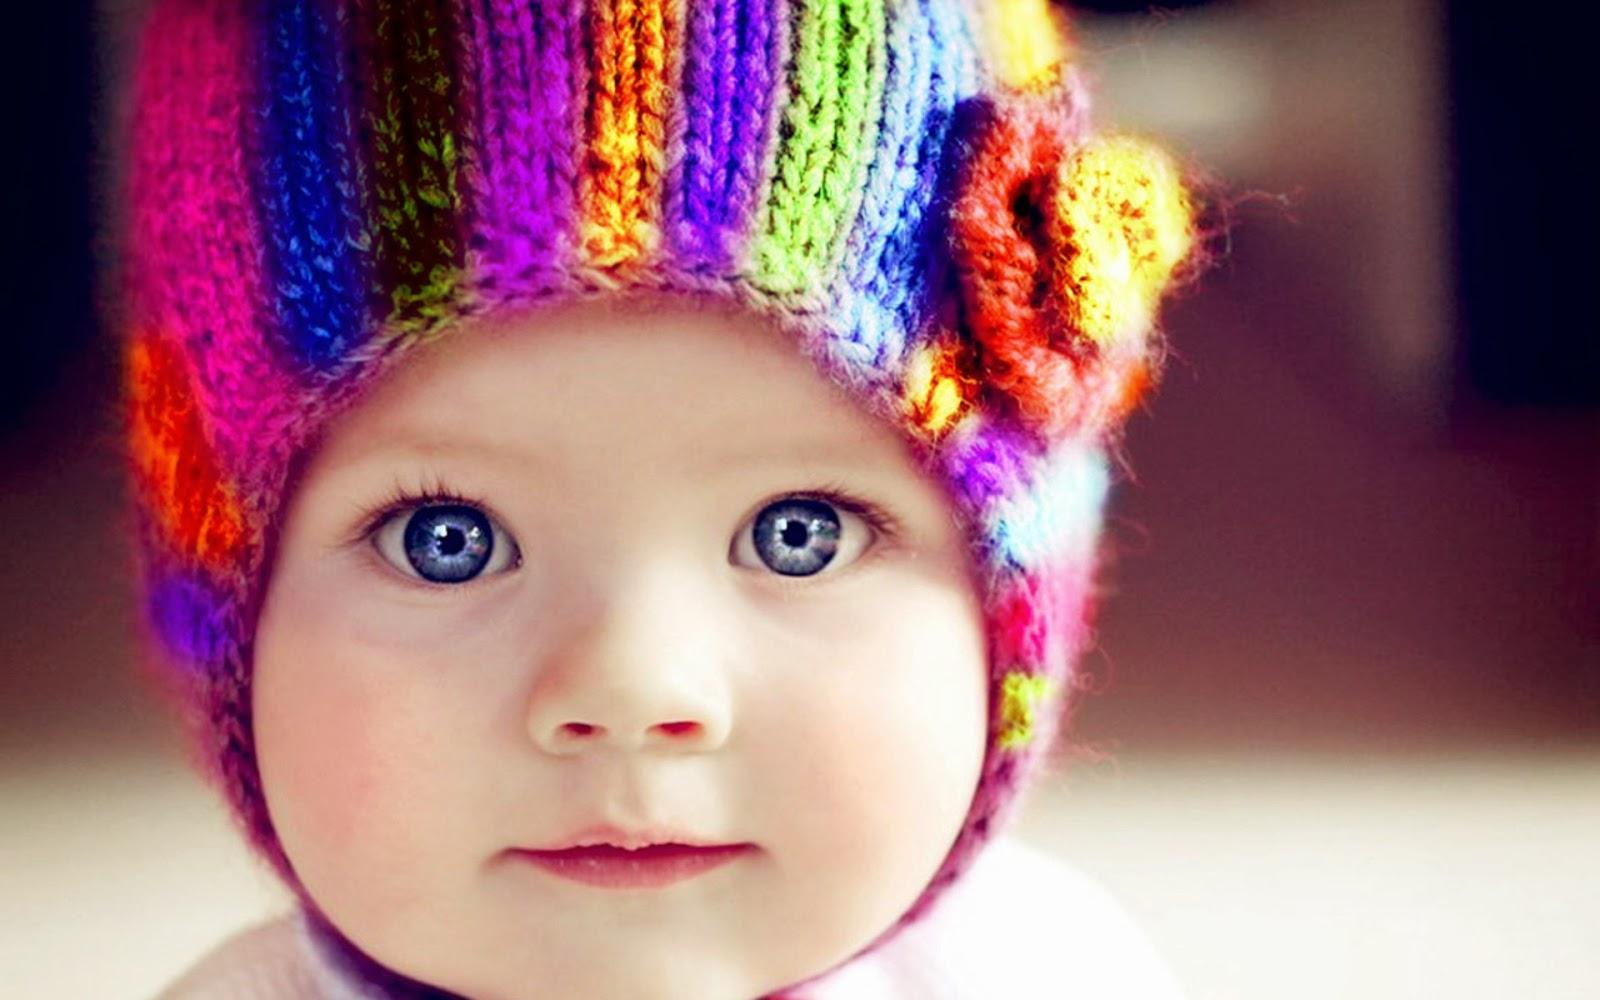 Colorfull baby eyes